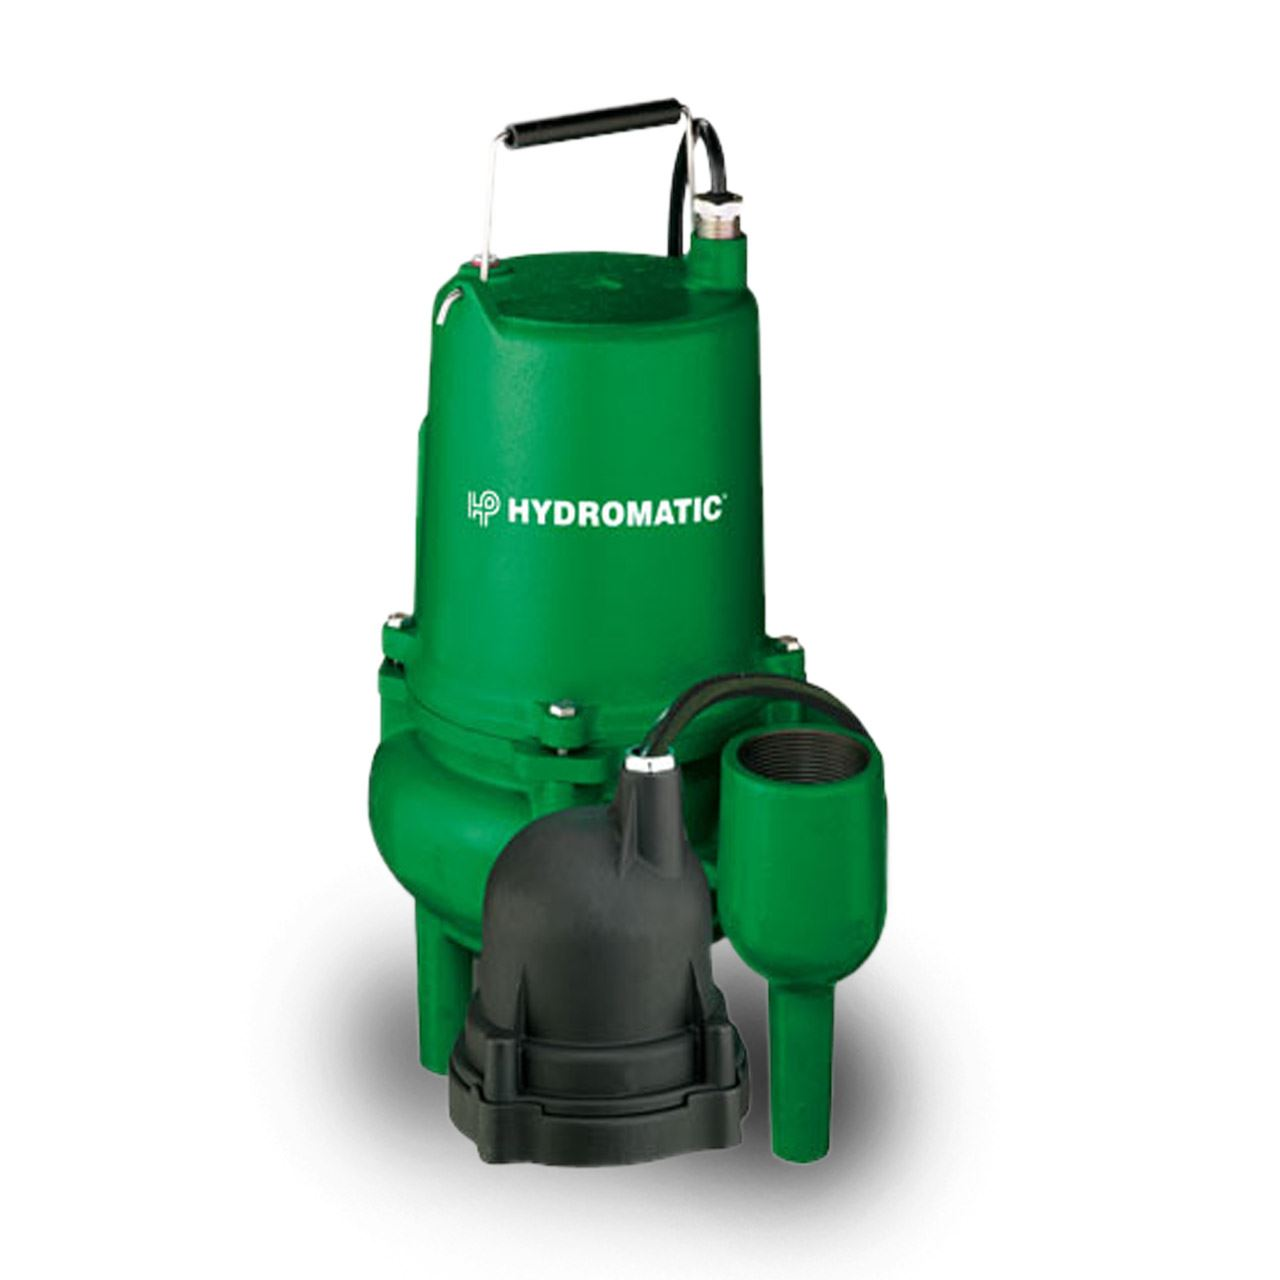 hydromatic pump hydromatic sp40m1 submersible sewage pump 0 4 hp rh rcworst com Payne Heat Pump Wiring Diagram A O. Smith Well Pump Parts Diagram